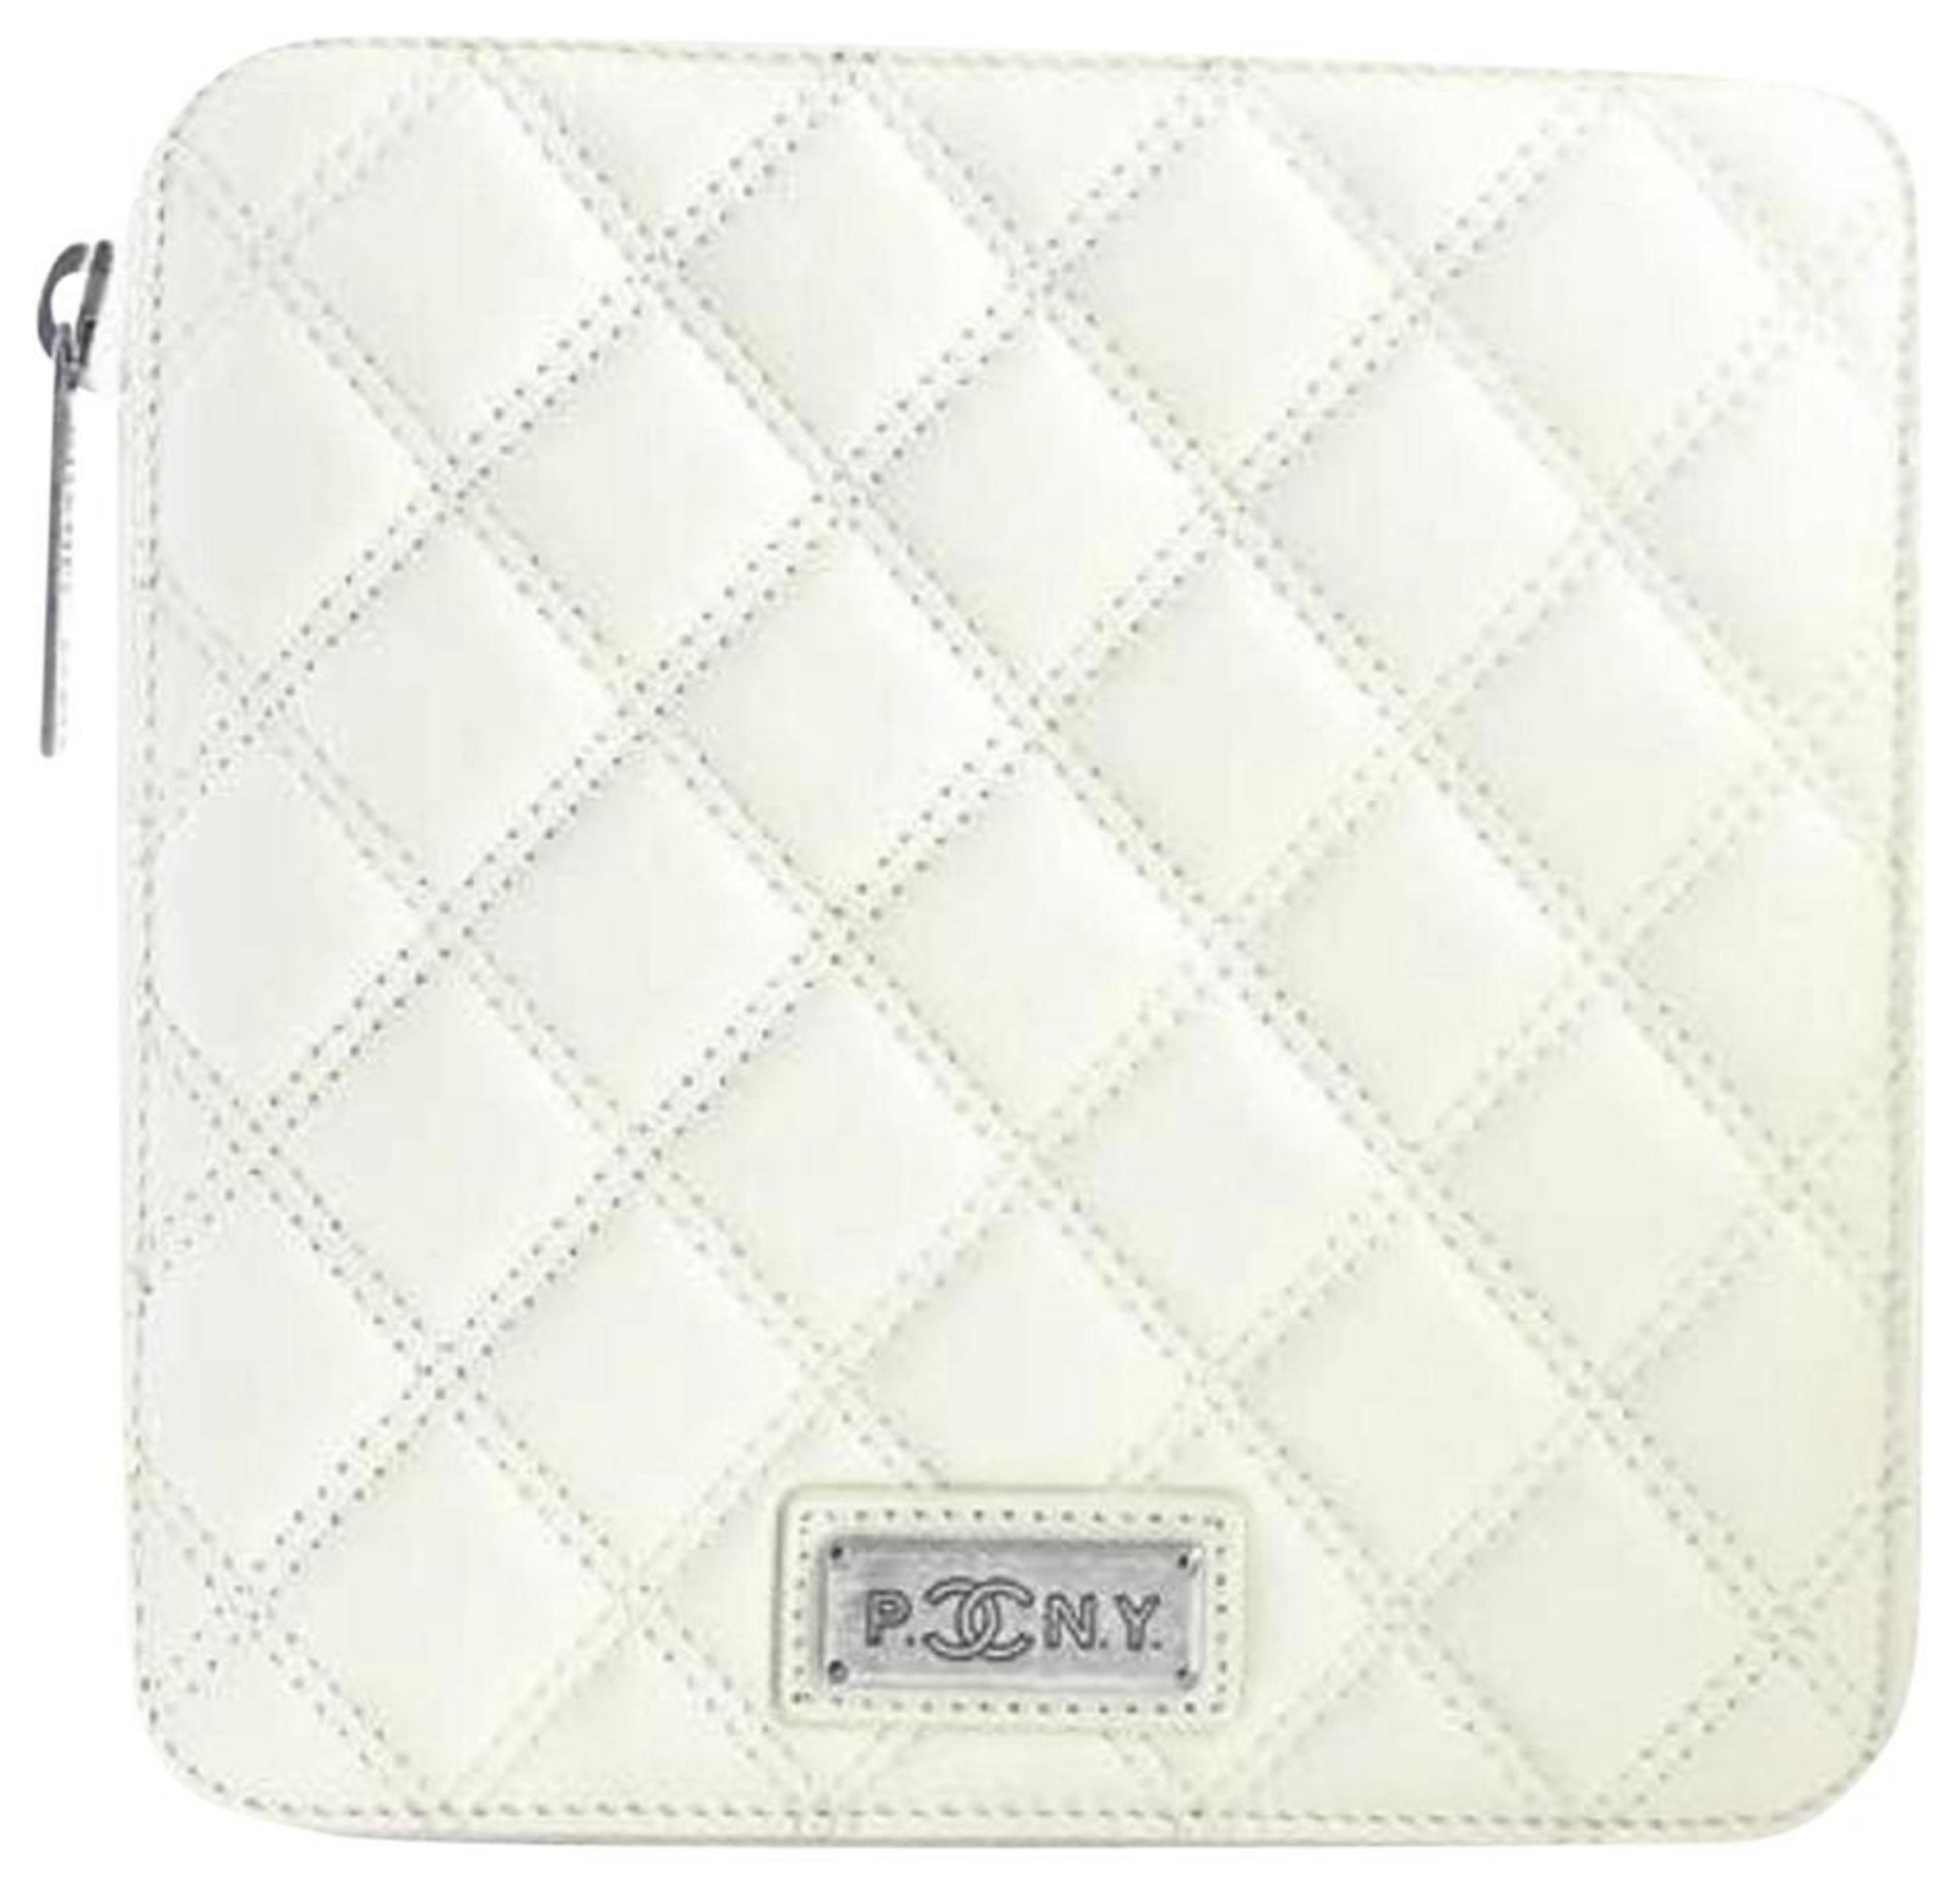 d50b81843ea4b3 Vintage Chanel Purses and Handbags at 1stdibs - Page 2